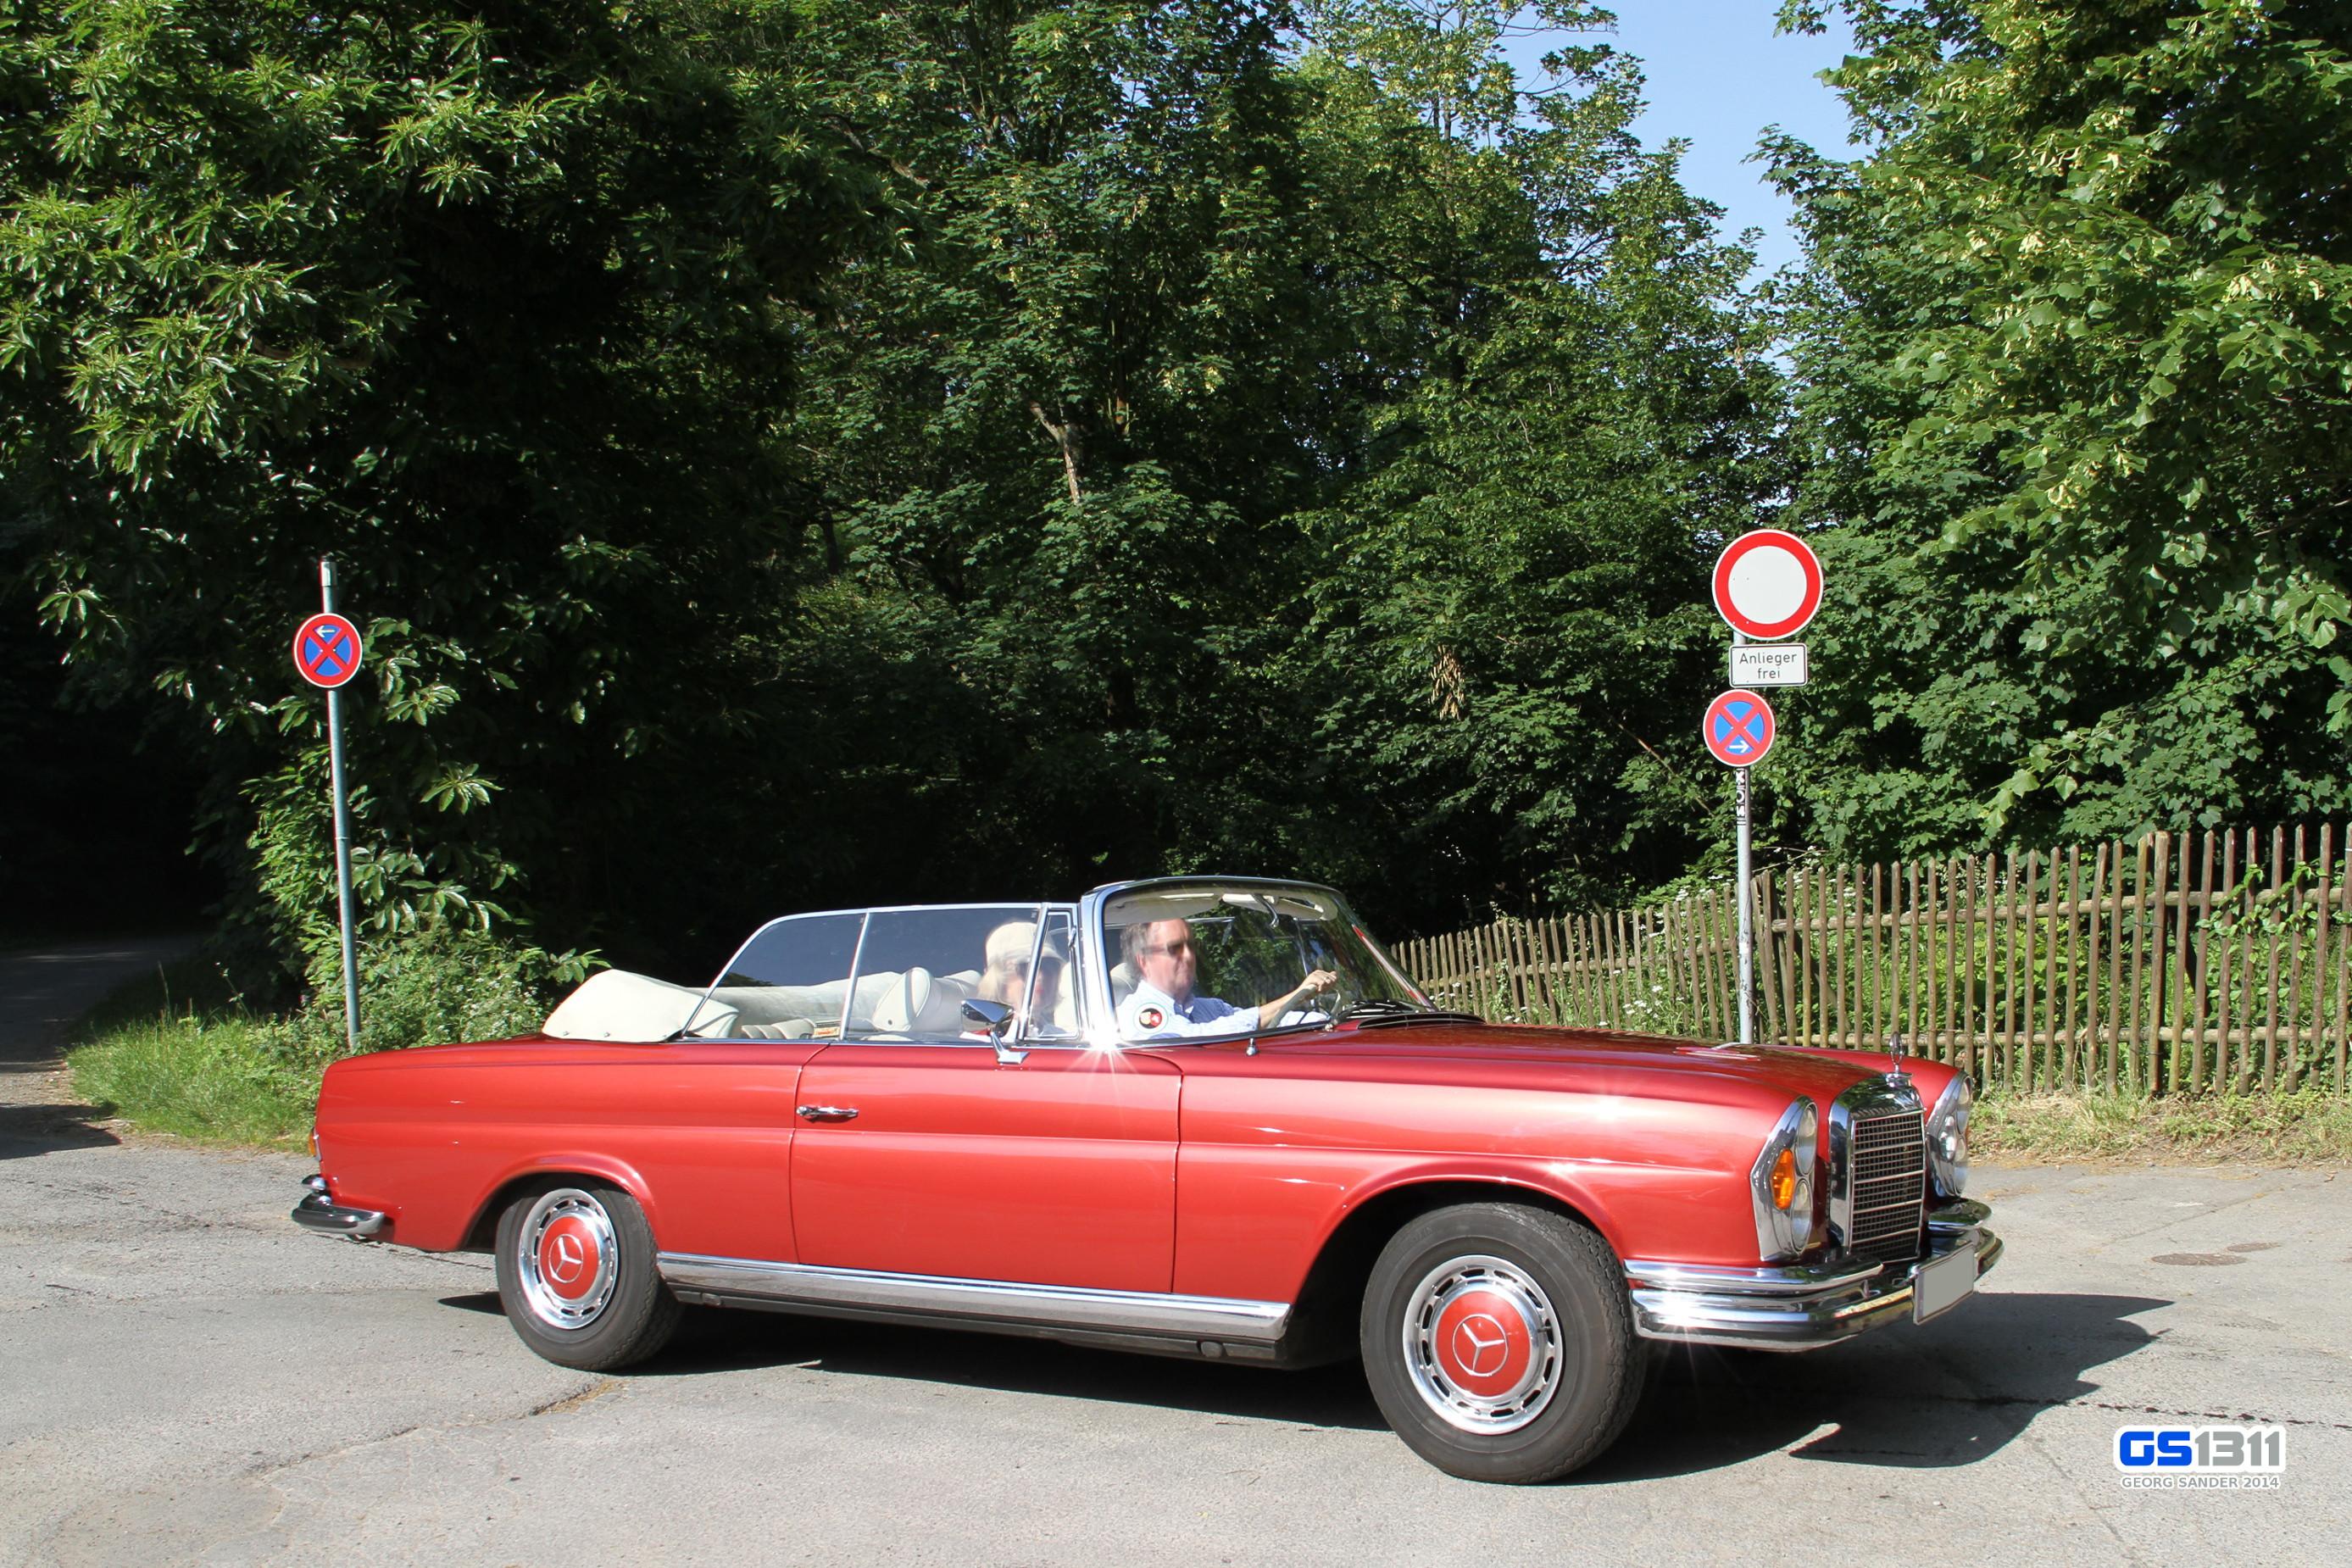 Baggrunde : gammel, sportsvogn, Cabrio, Vintage bil, Cabriolet, Oldtimer, ydeevne bil, Sedan ...